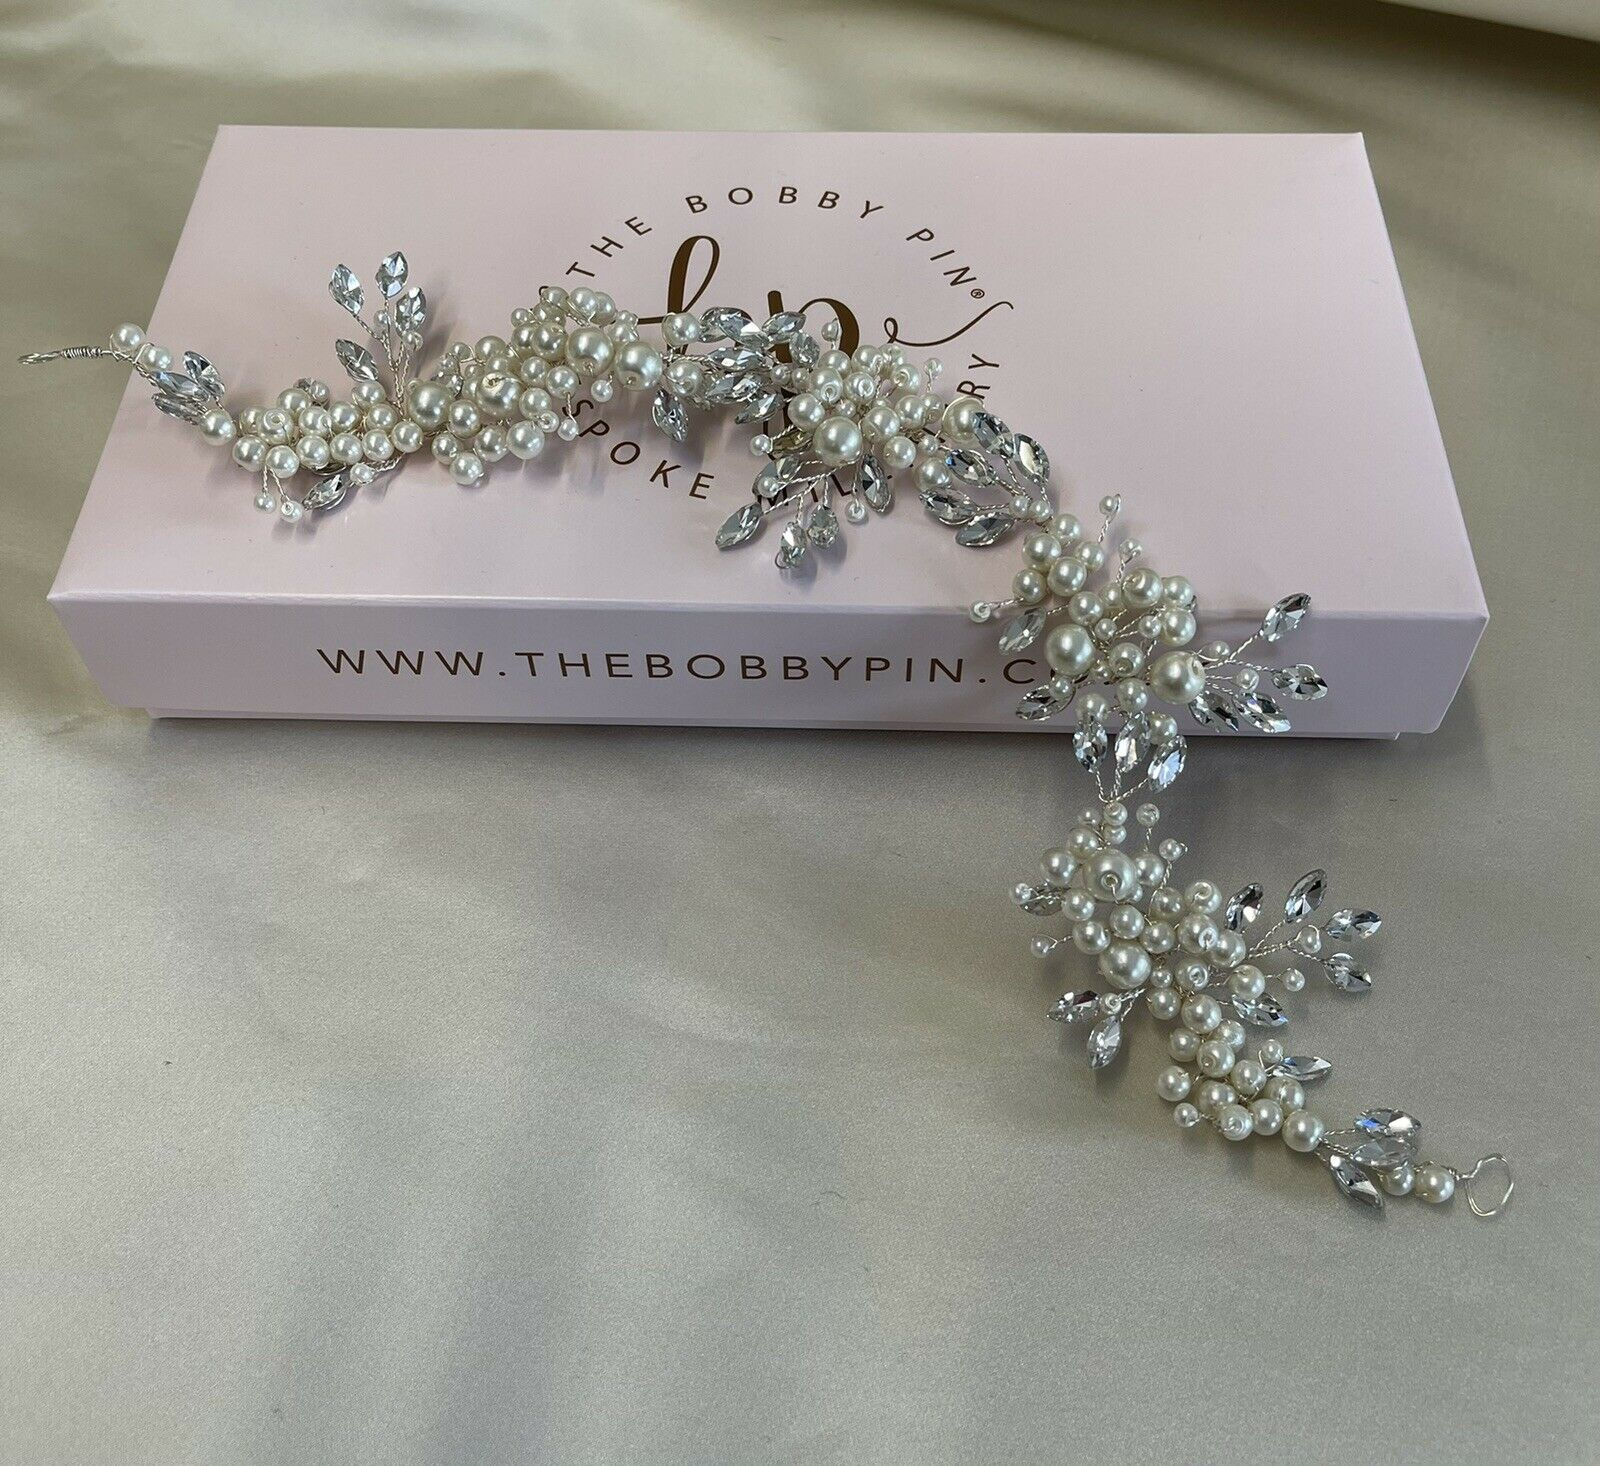 Stunning Silver Bridal Hair Vine/Tiara with Crystals & Pearls - UK Seller